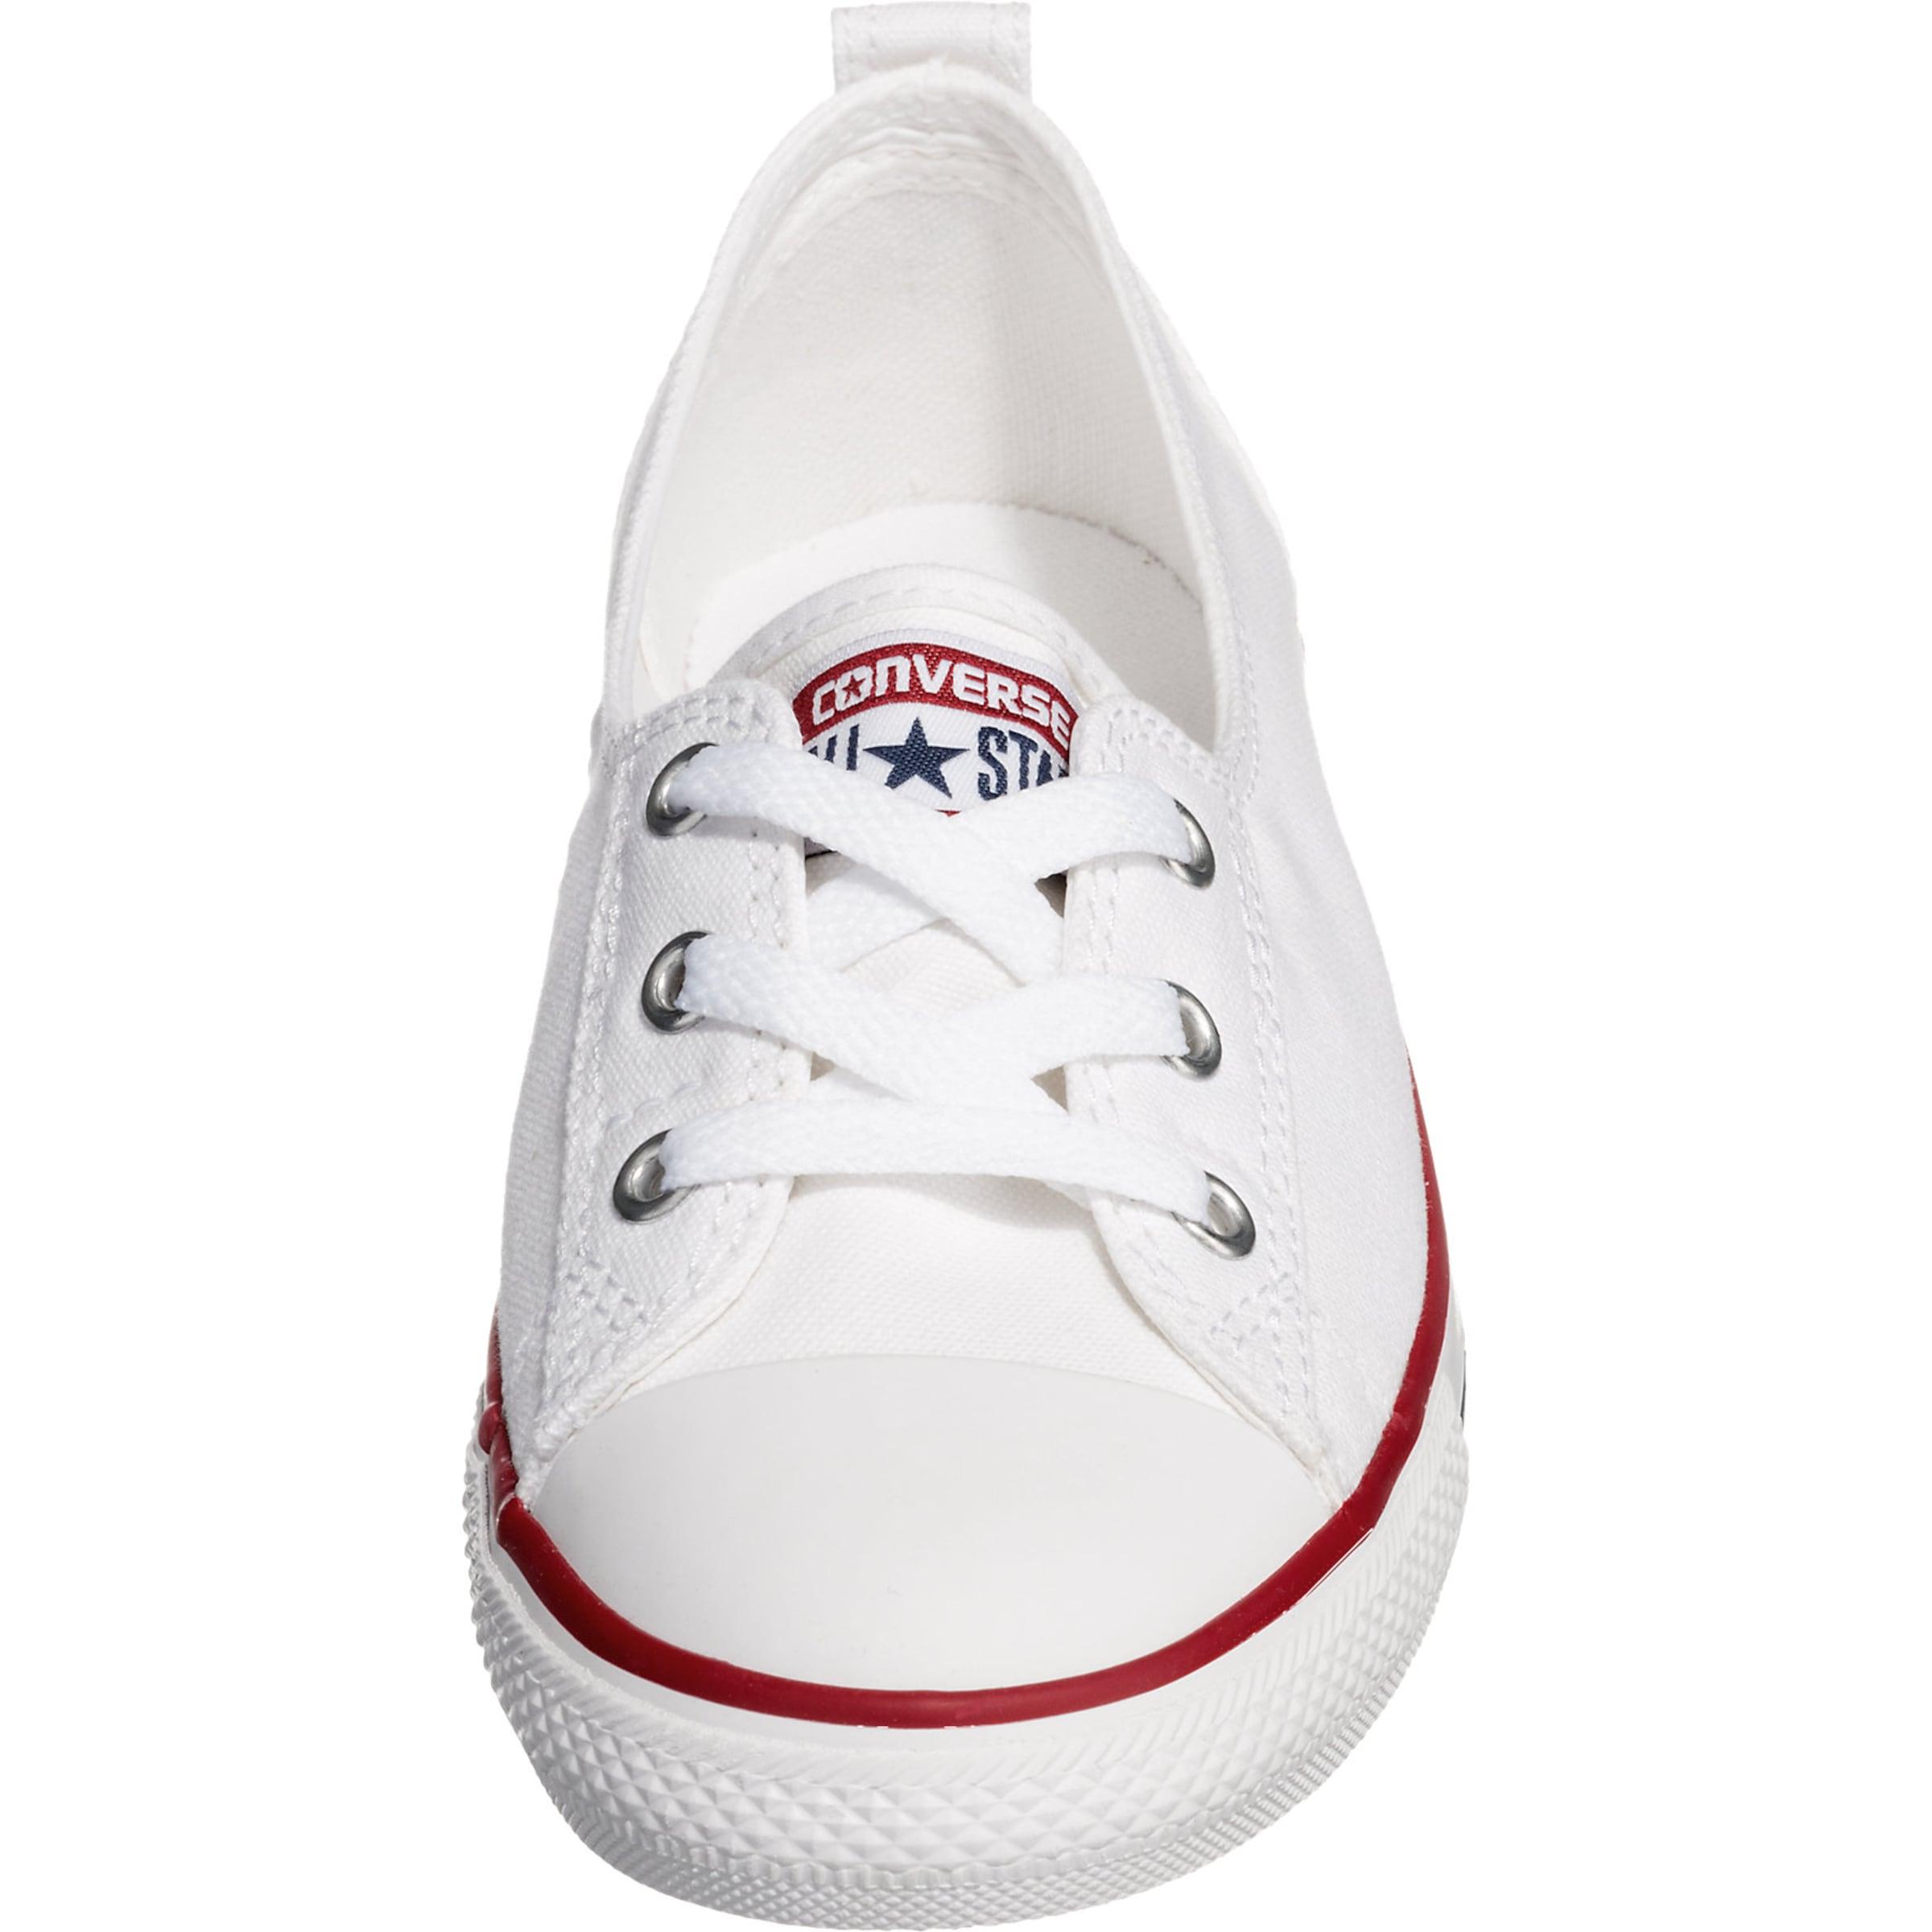 Perfekt Zum Verkauf CONVERSE Sneaker 'Chuck Taylor All Star' Günstigsten Online Verkauf Freies Verschiffen Auslass Größte Lieferant Hohe Qualität Günstiger Preis xsZVZ